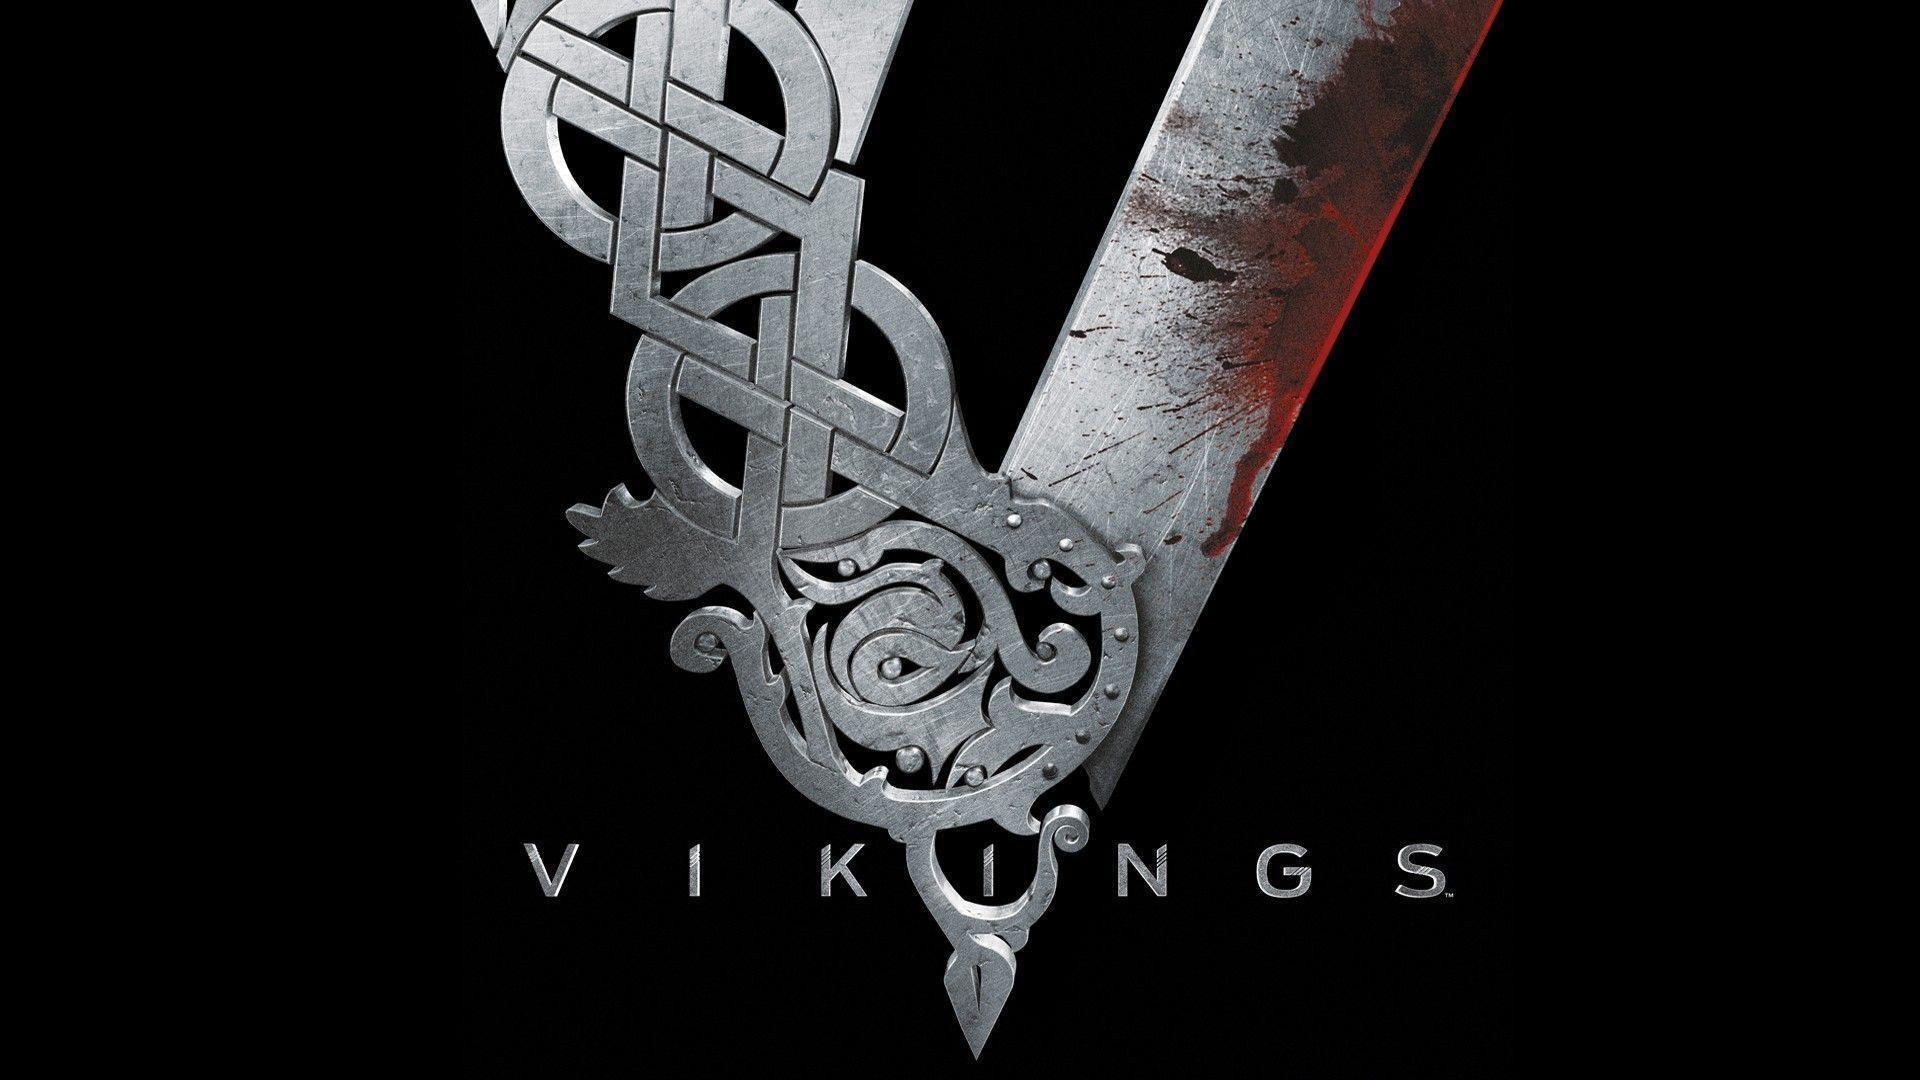 Res: 1920x1080, Vikings TV Show HD Wallpaper #2369 | Frenzia.com